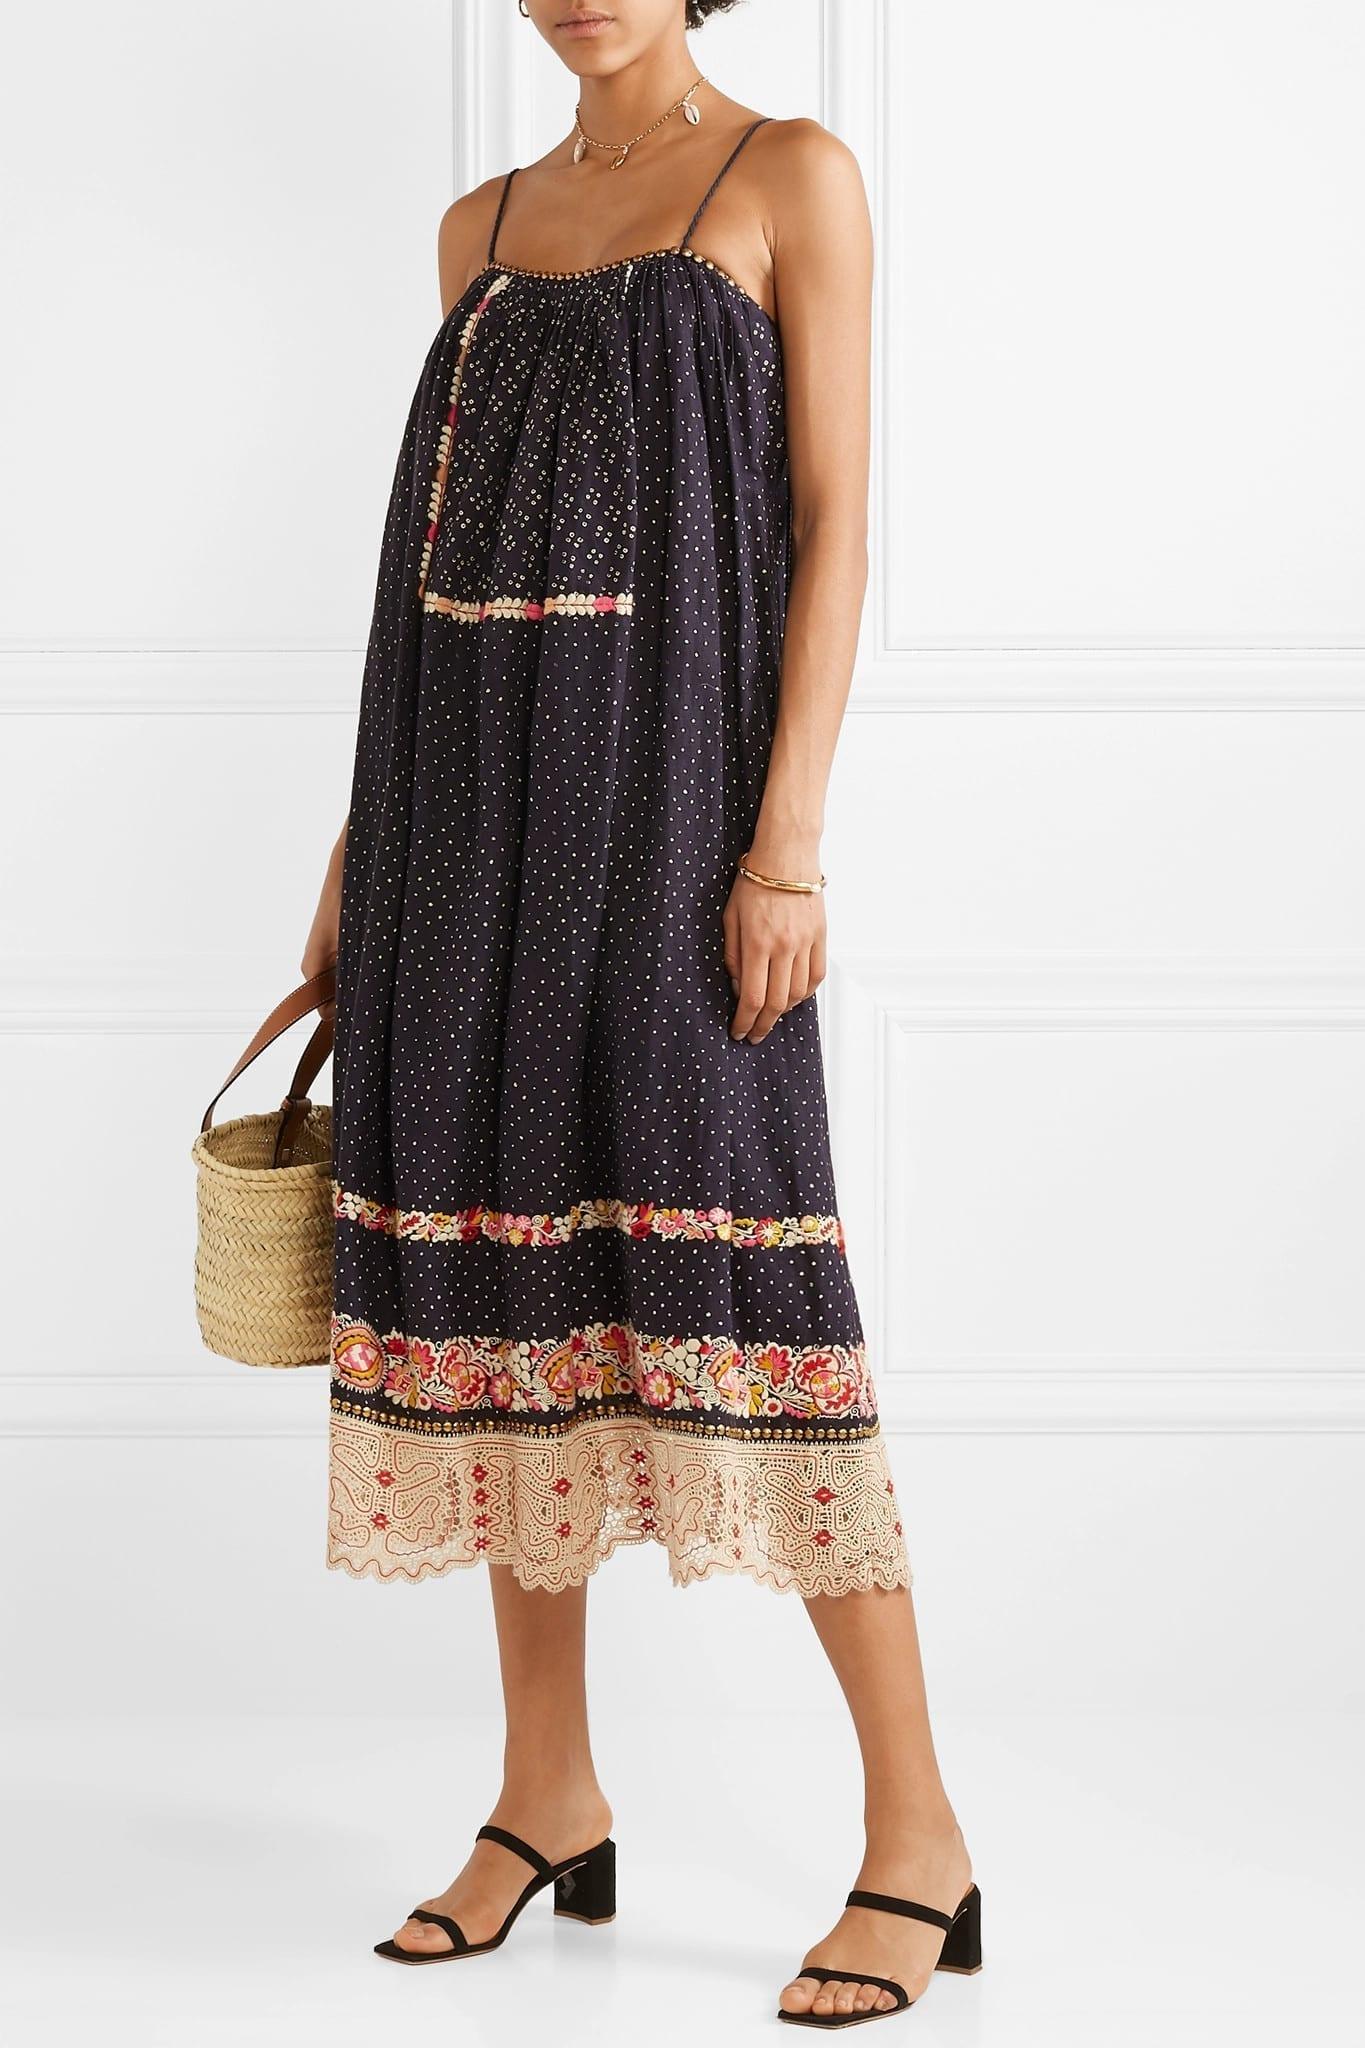 ULLA JOHNSON Nara Studded Embroidered Linen And Cotton-Blend Navy Dress